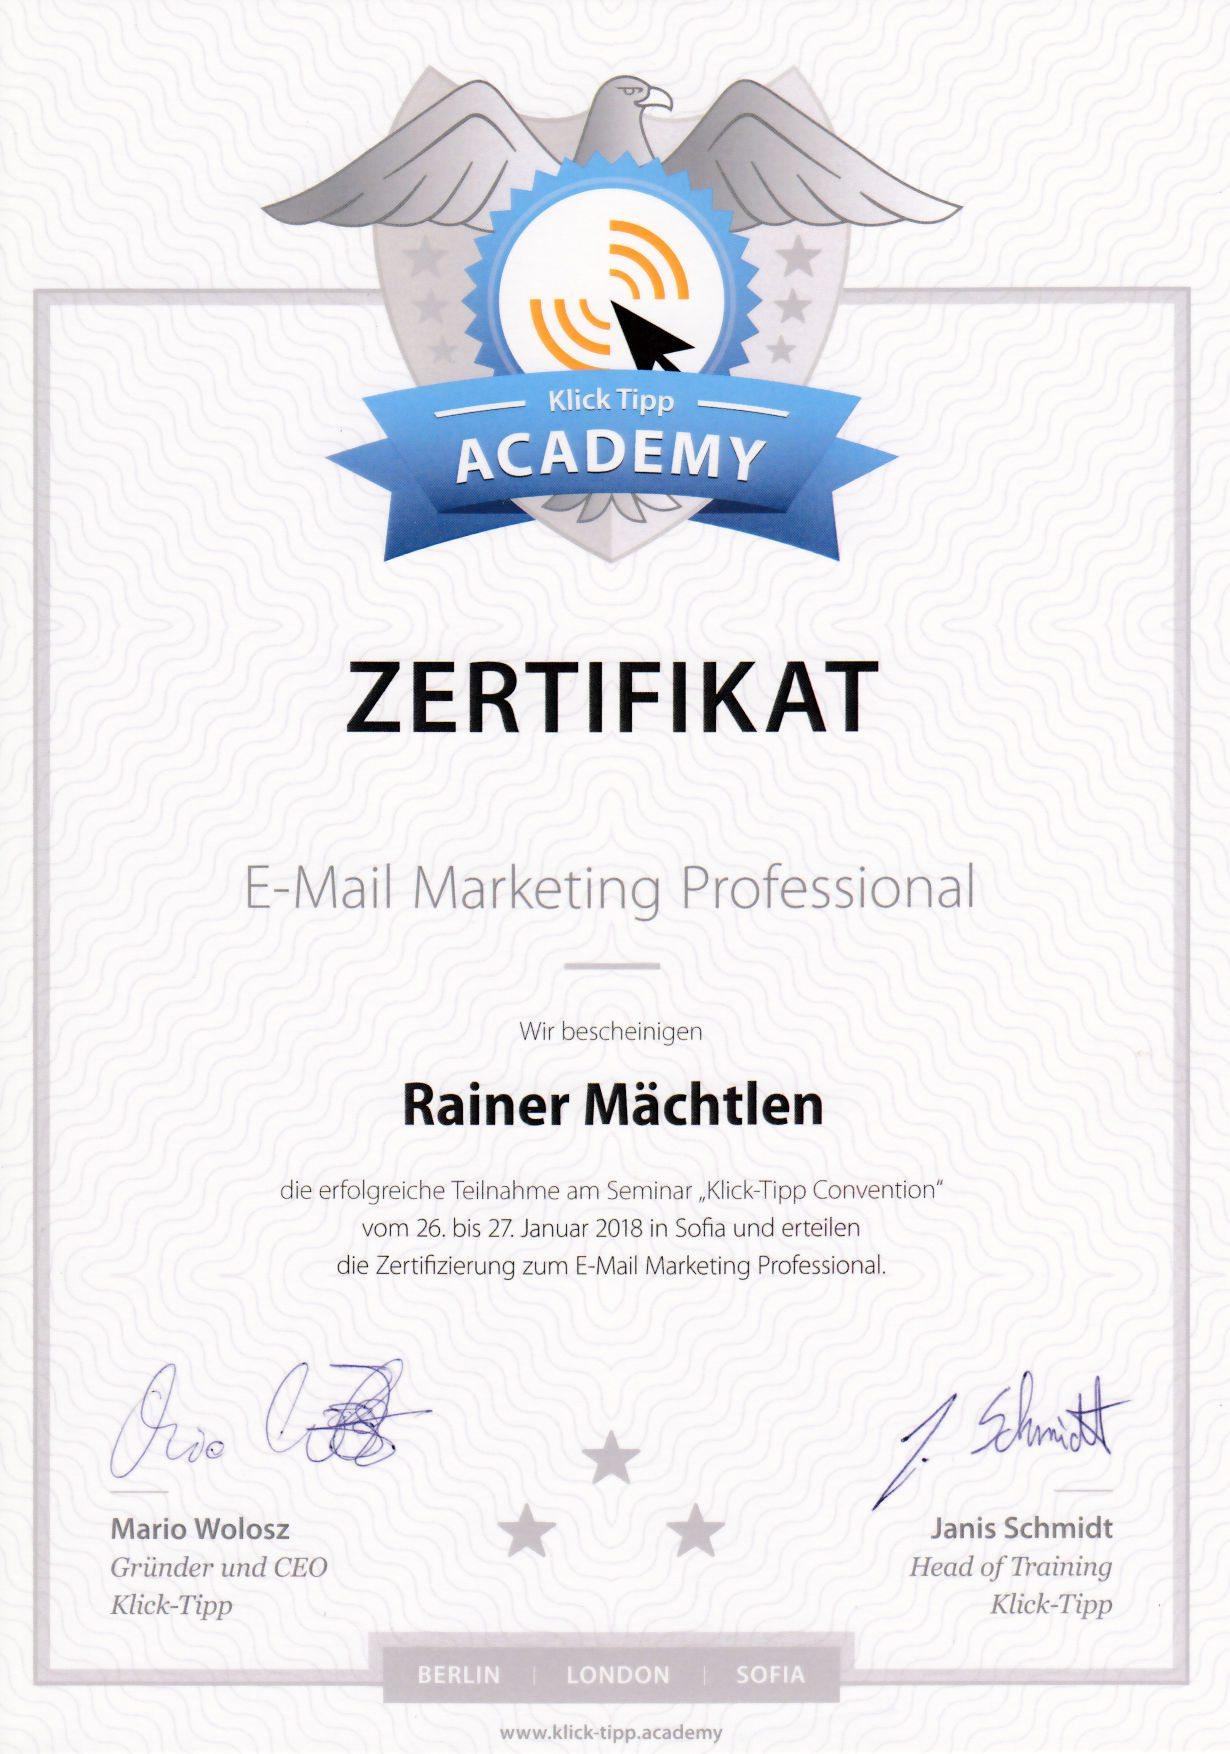 Klick Tipp Zertifikat E-Mail Marketing Professional